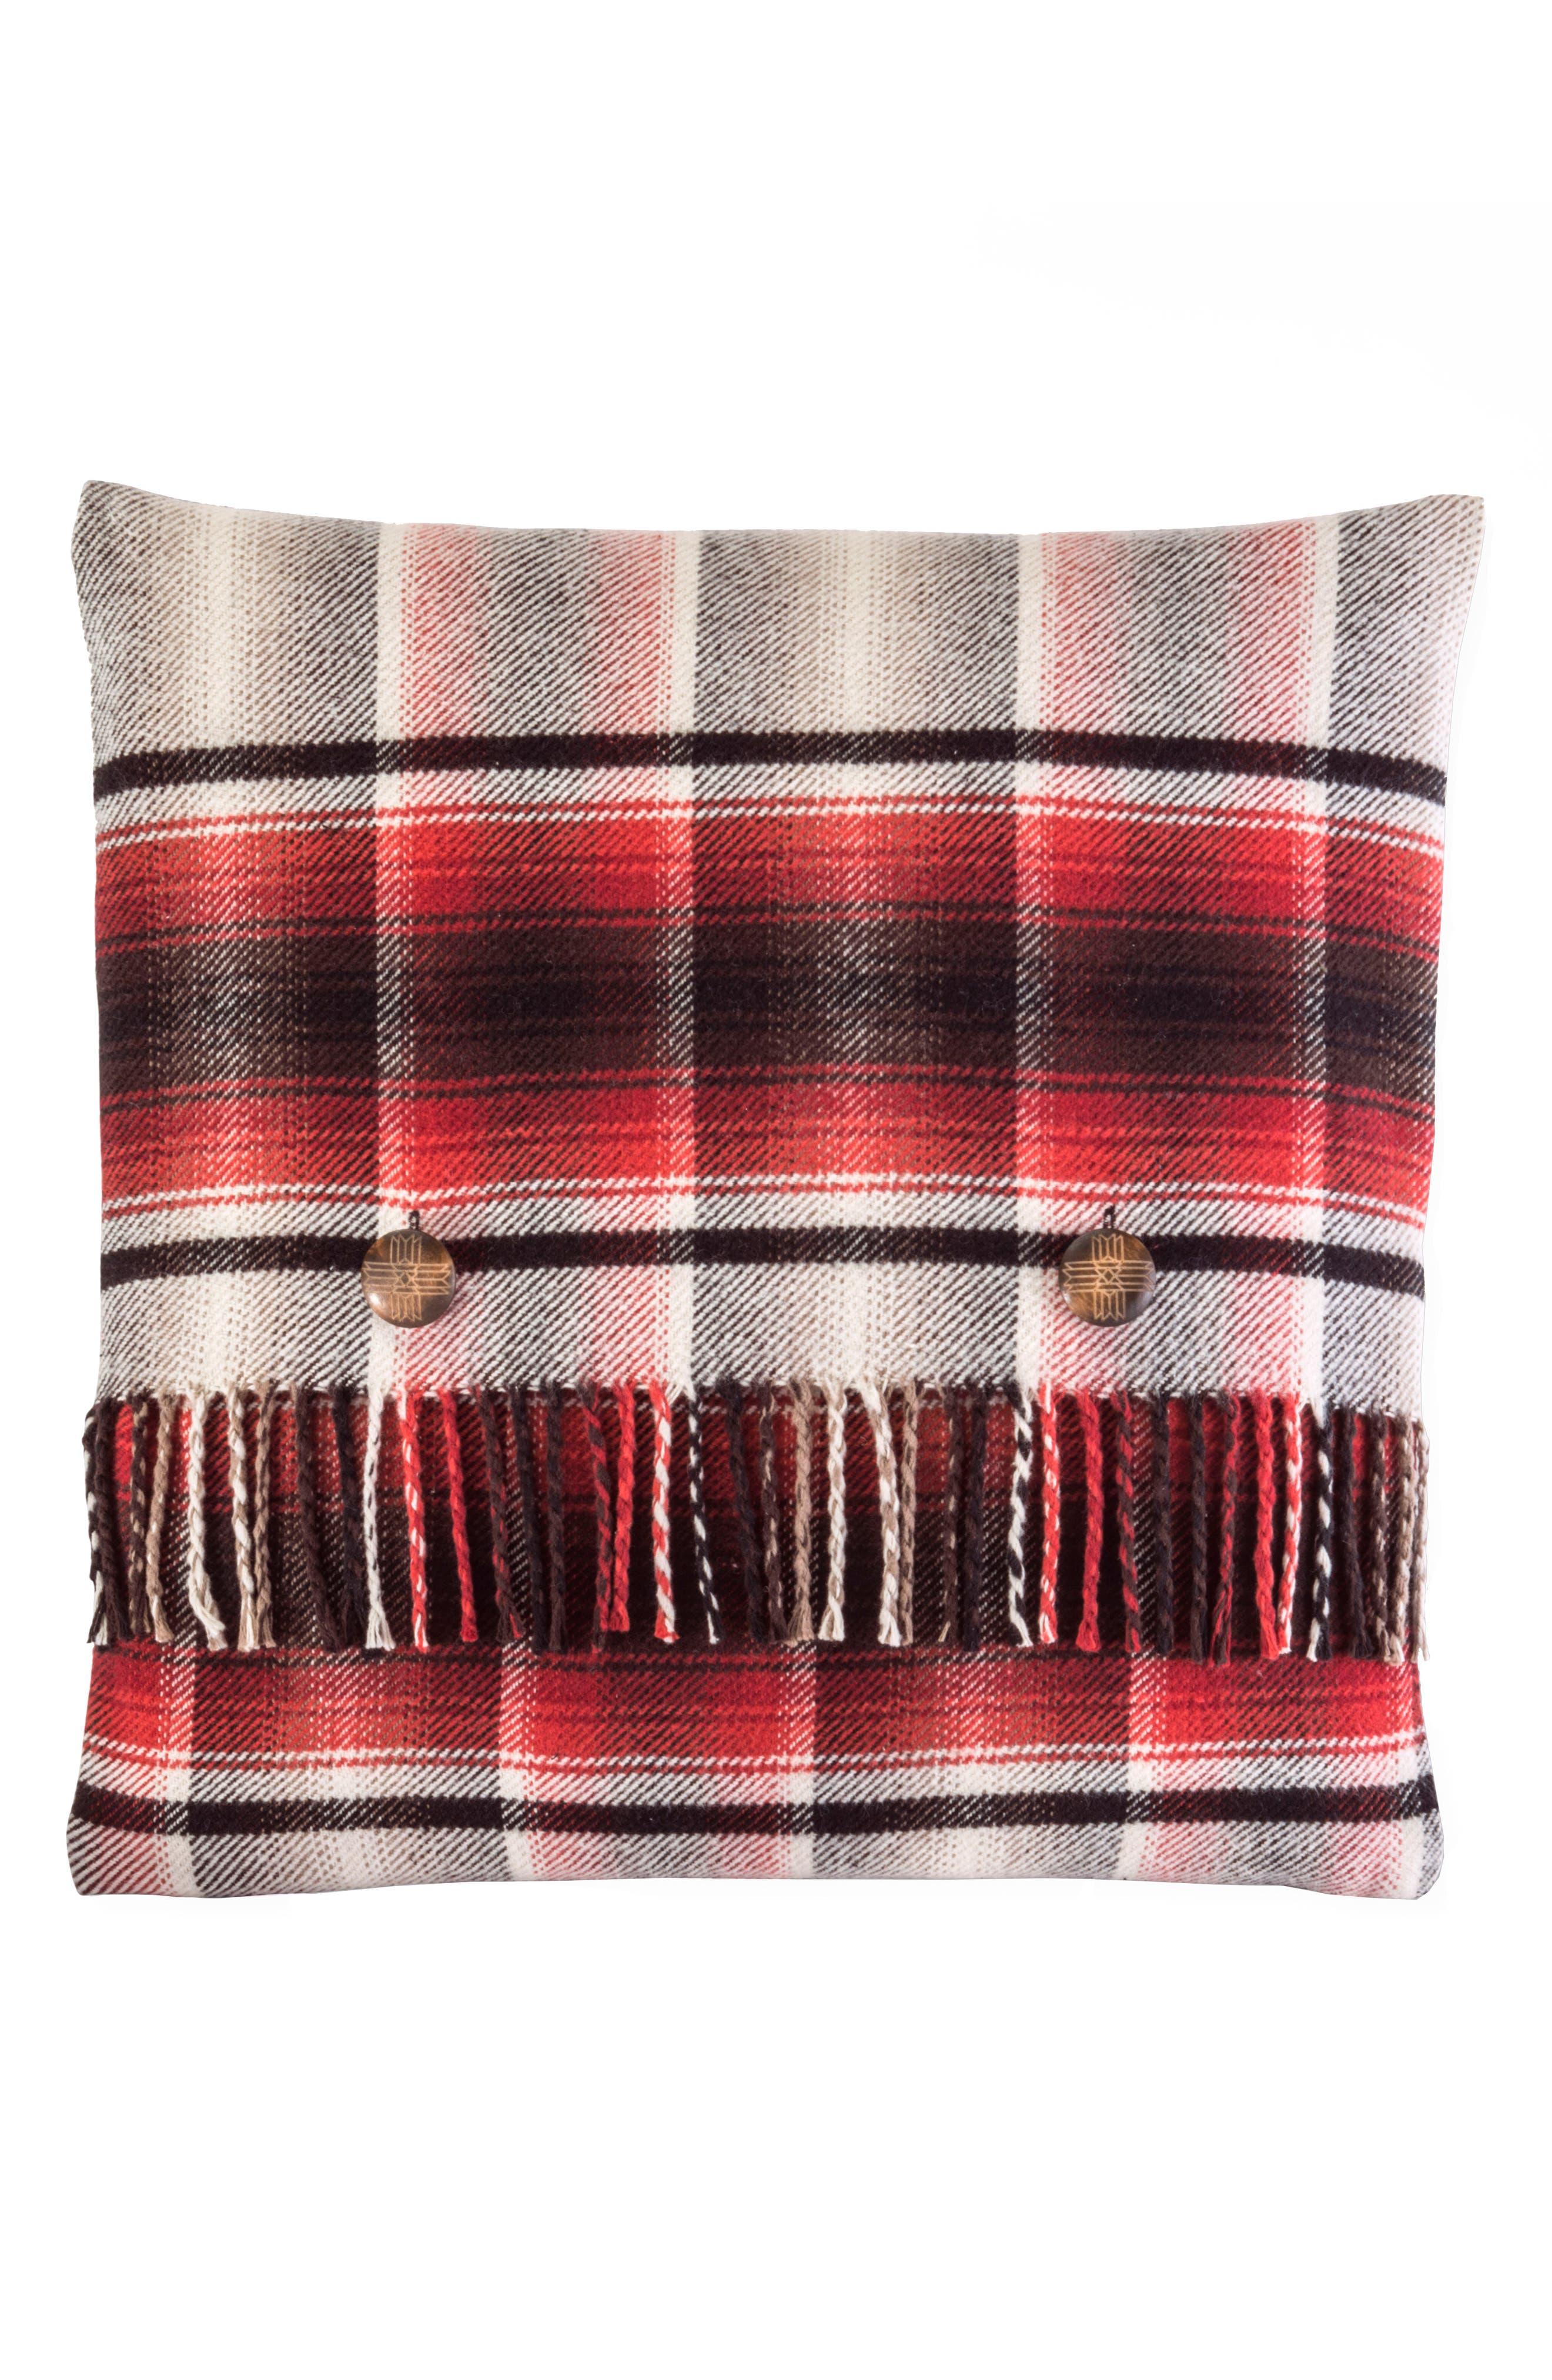 Board Shirt Plaid Pillow,                         Main,                         color, 600